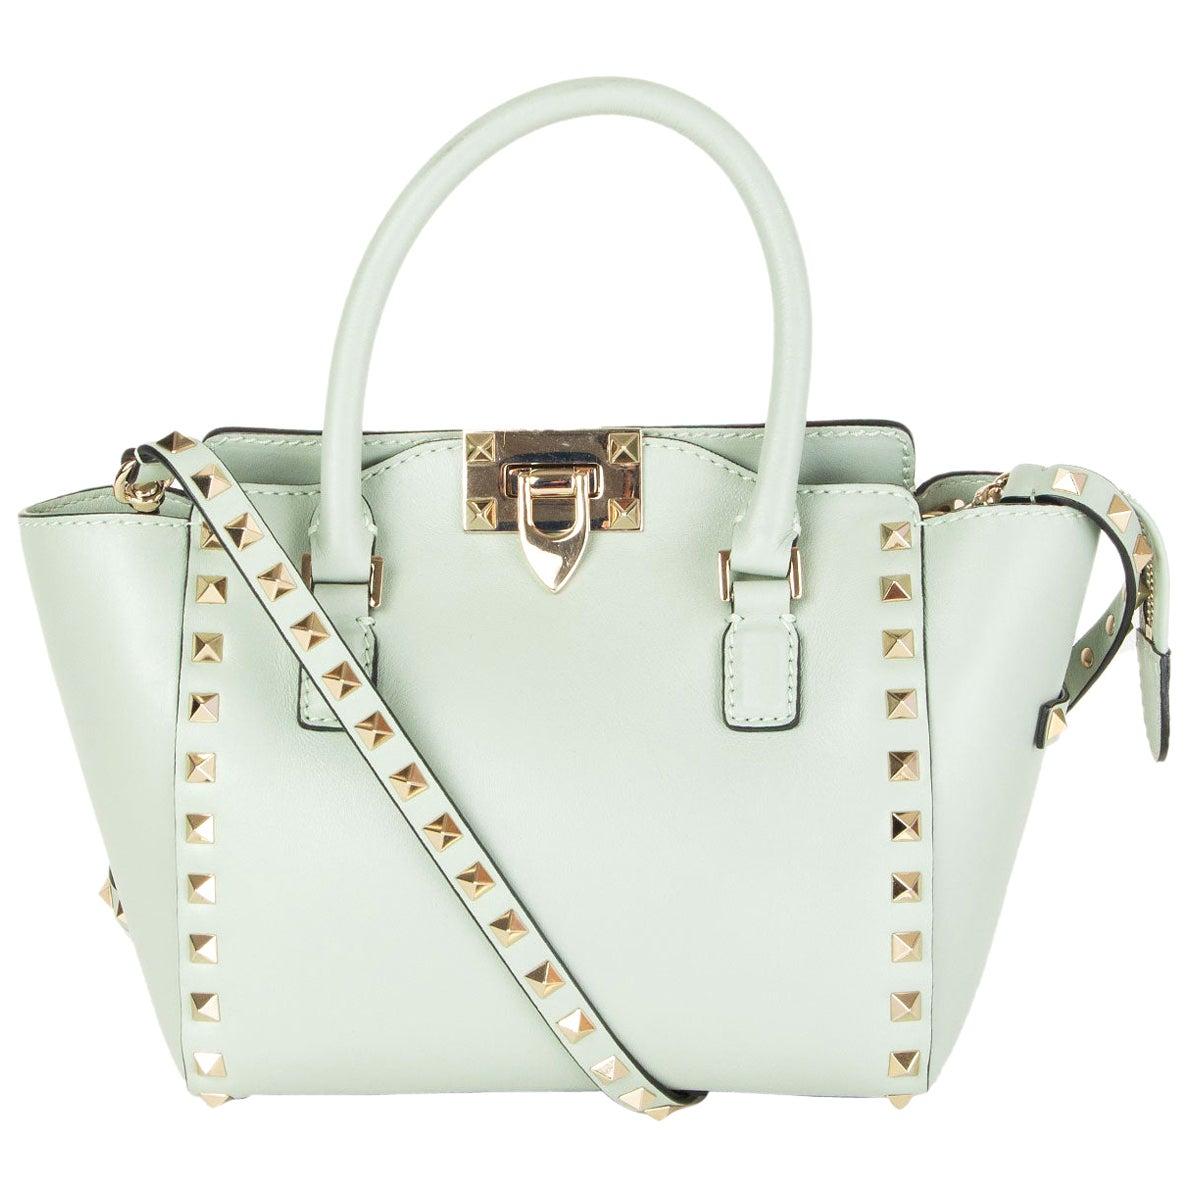 VALENTINO pastel green ROCKSTUD MINI DOUBLE HANDLE TOTE Bag